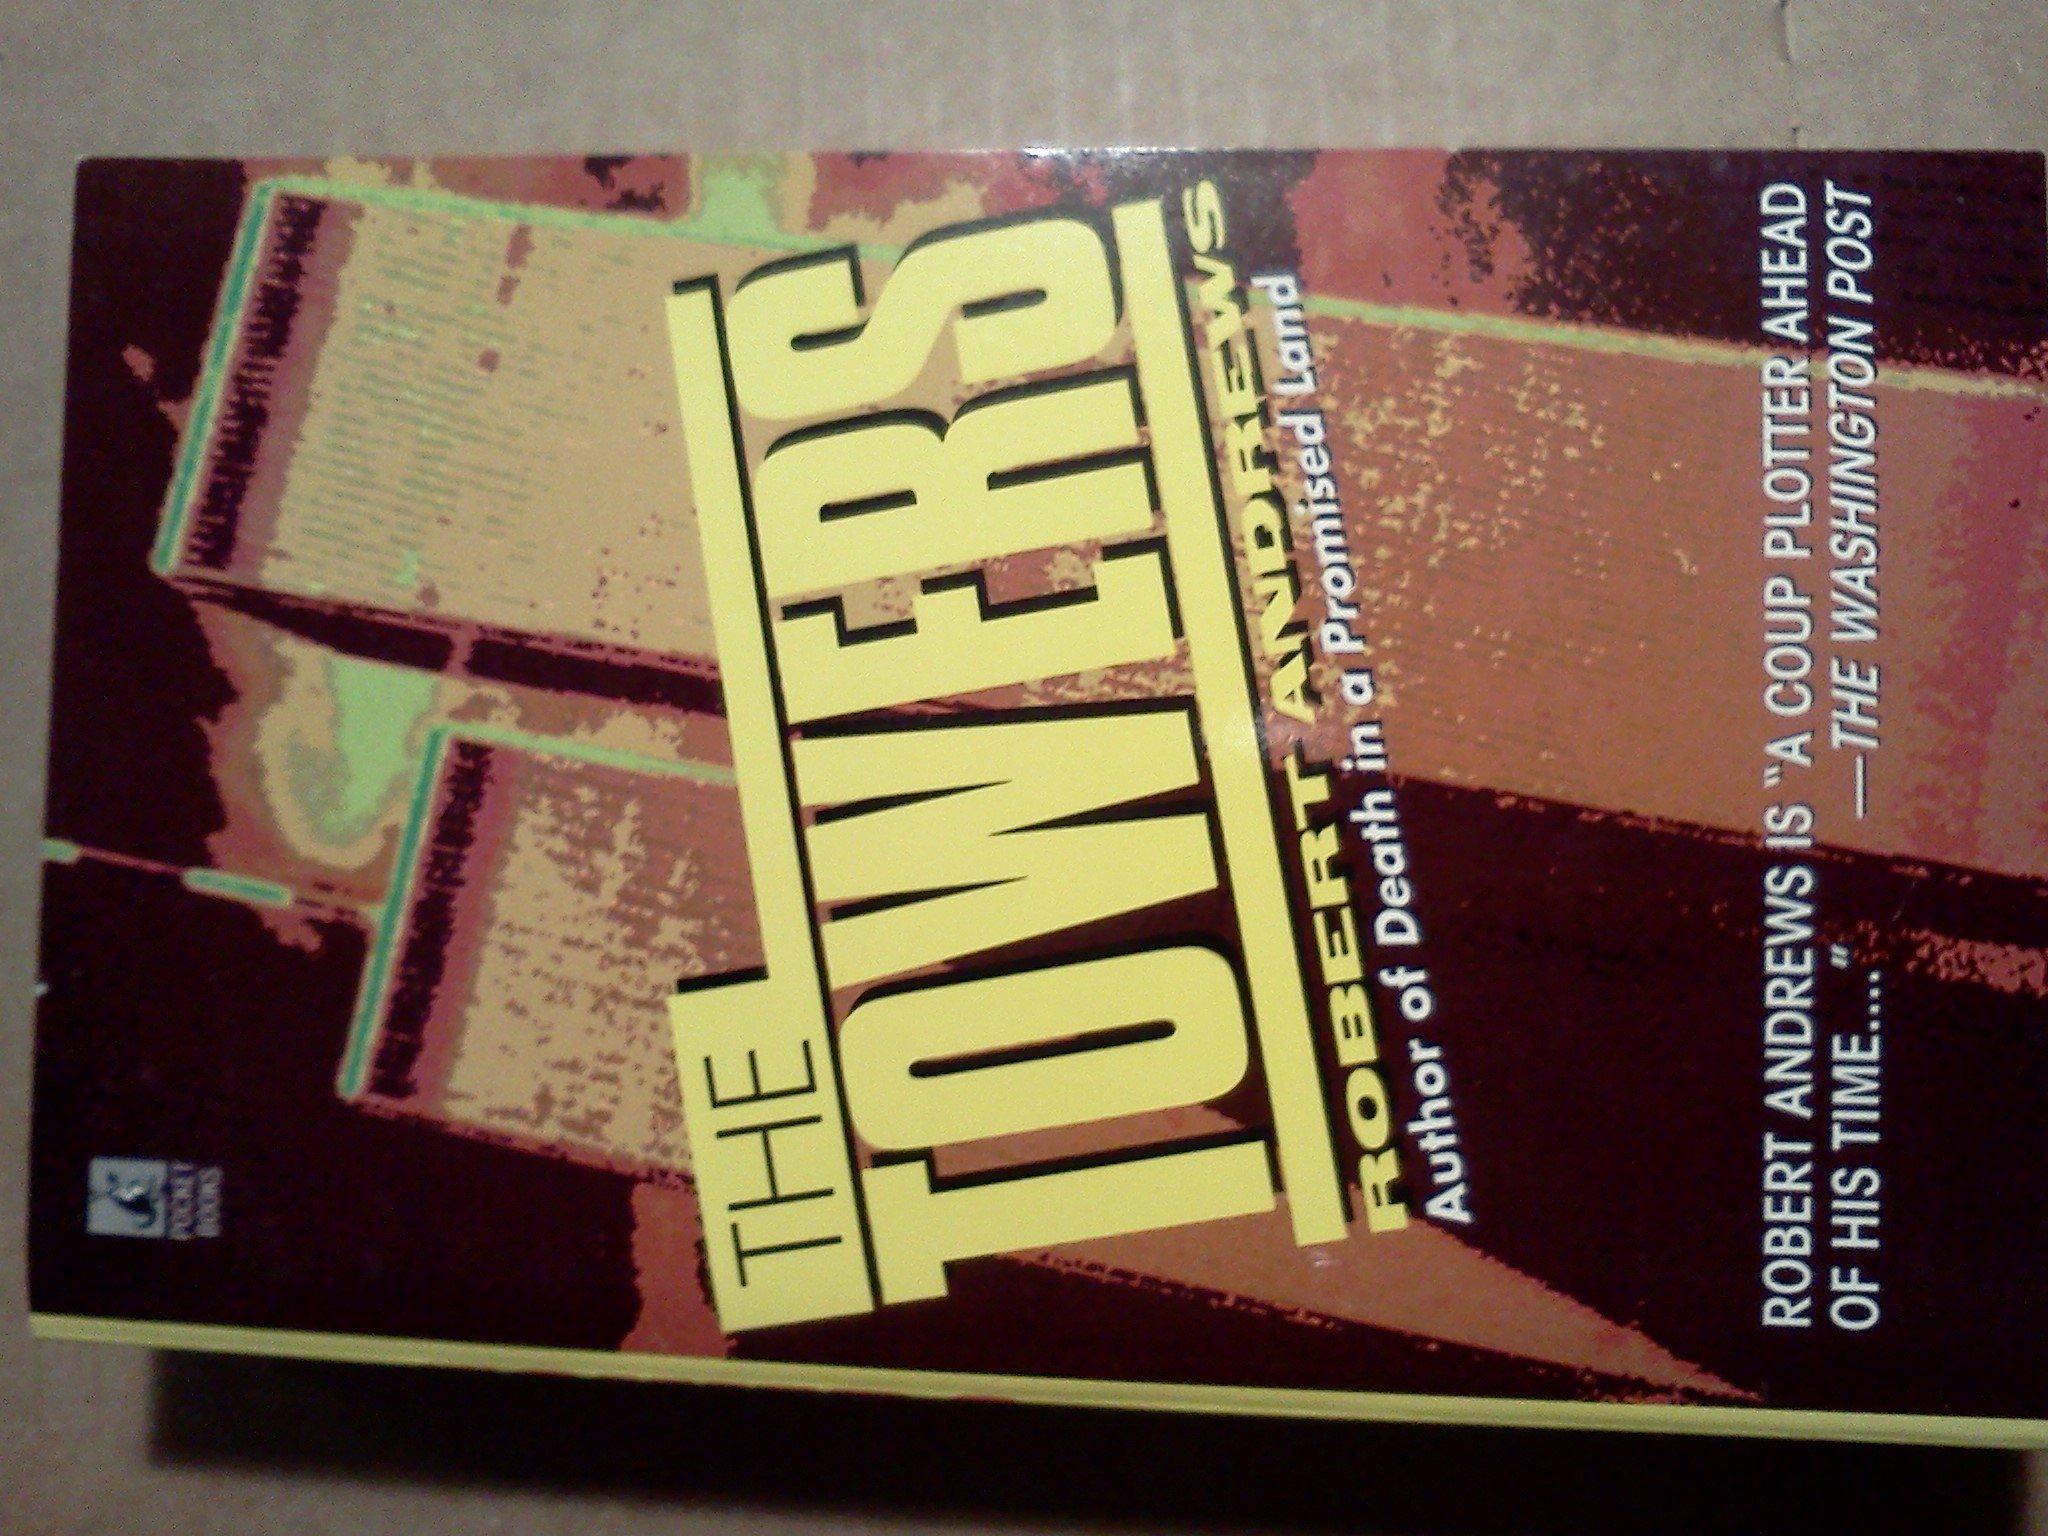 The Towers: Amazon.es: Andrews, Robert: Libros en idiomas extranjeros